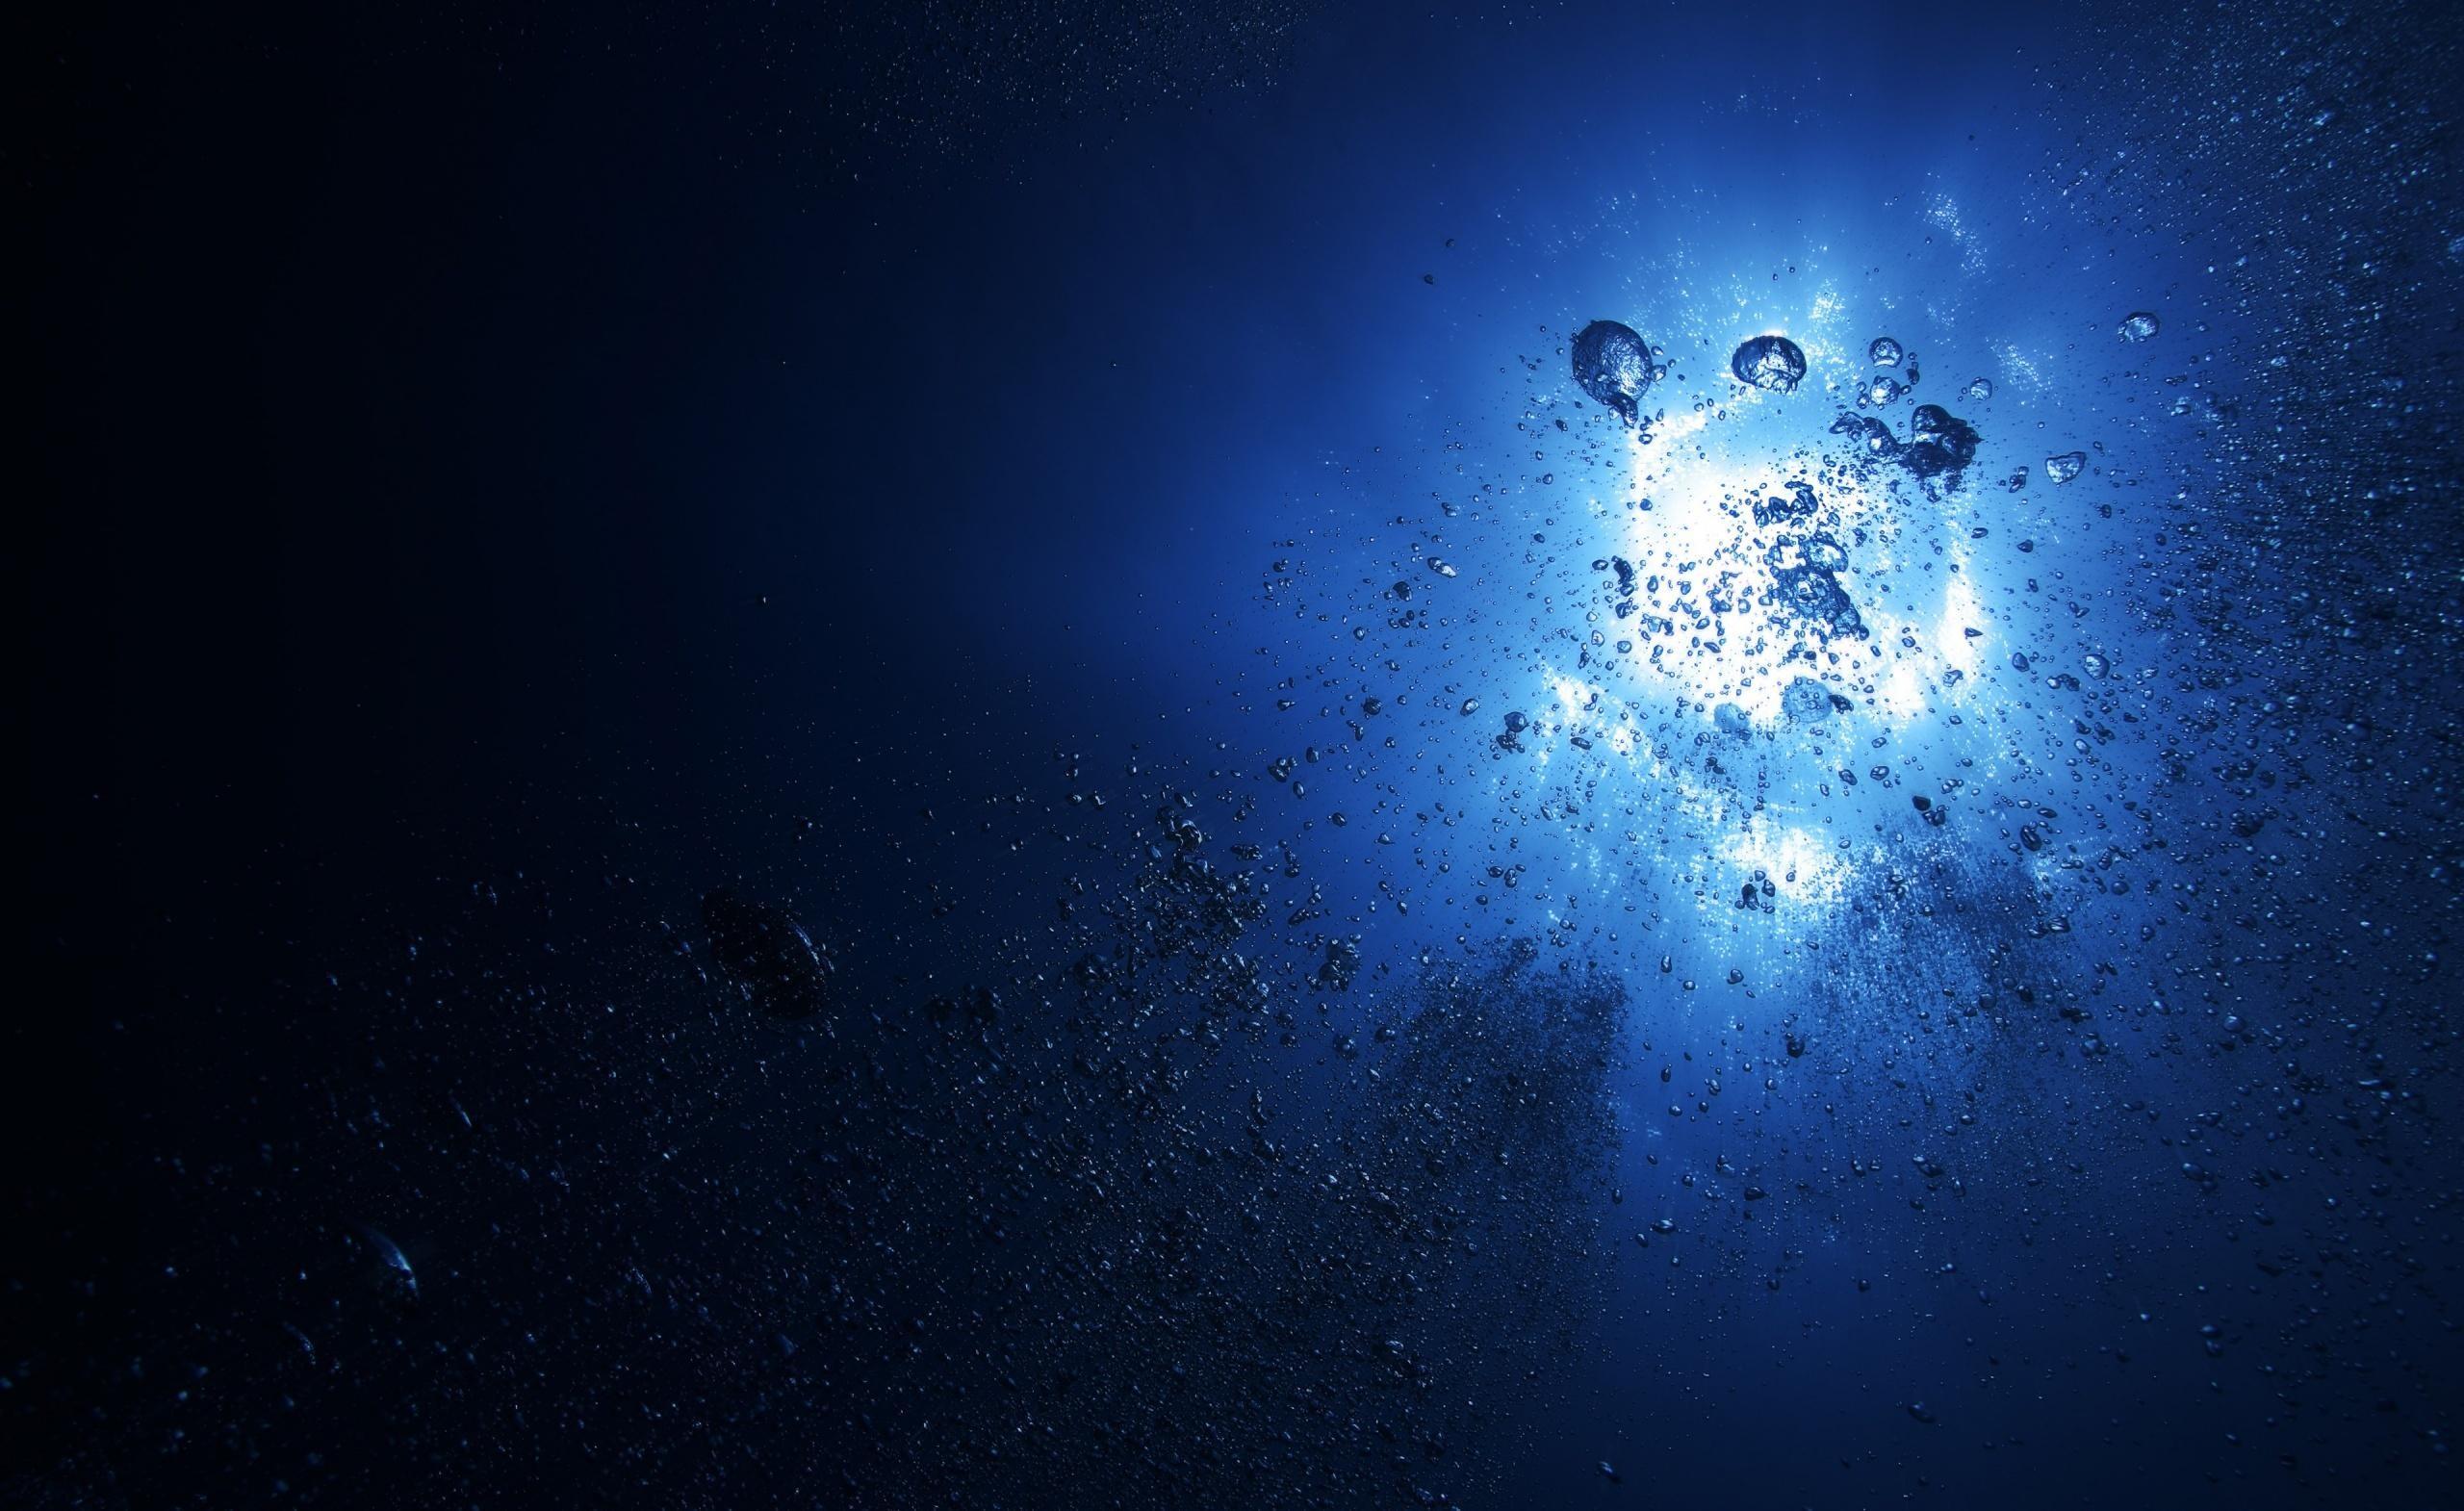 Water-light-bubbles-depth-dark-blue-background